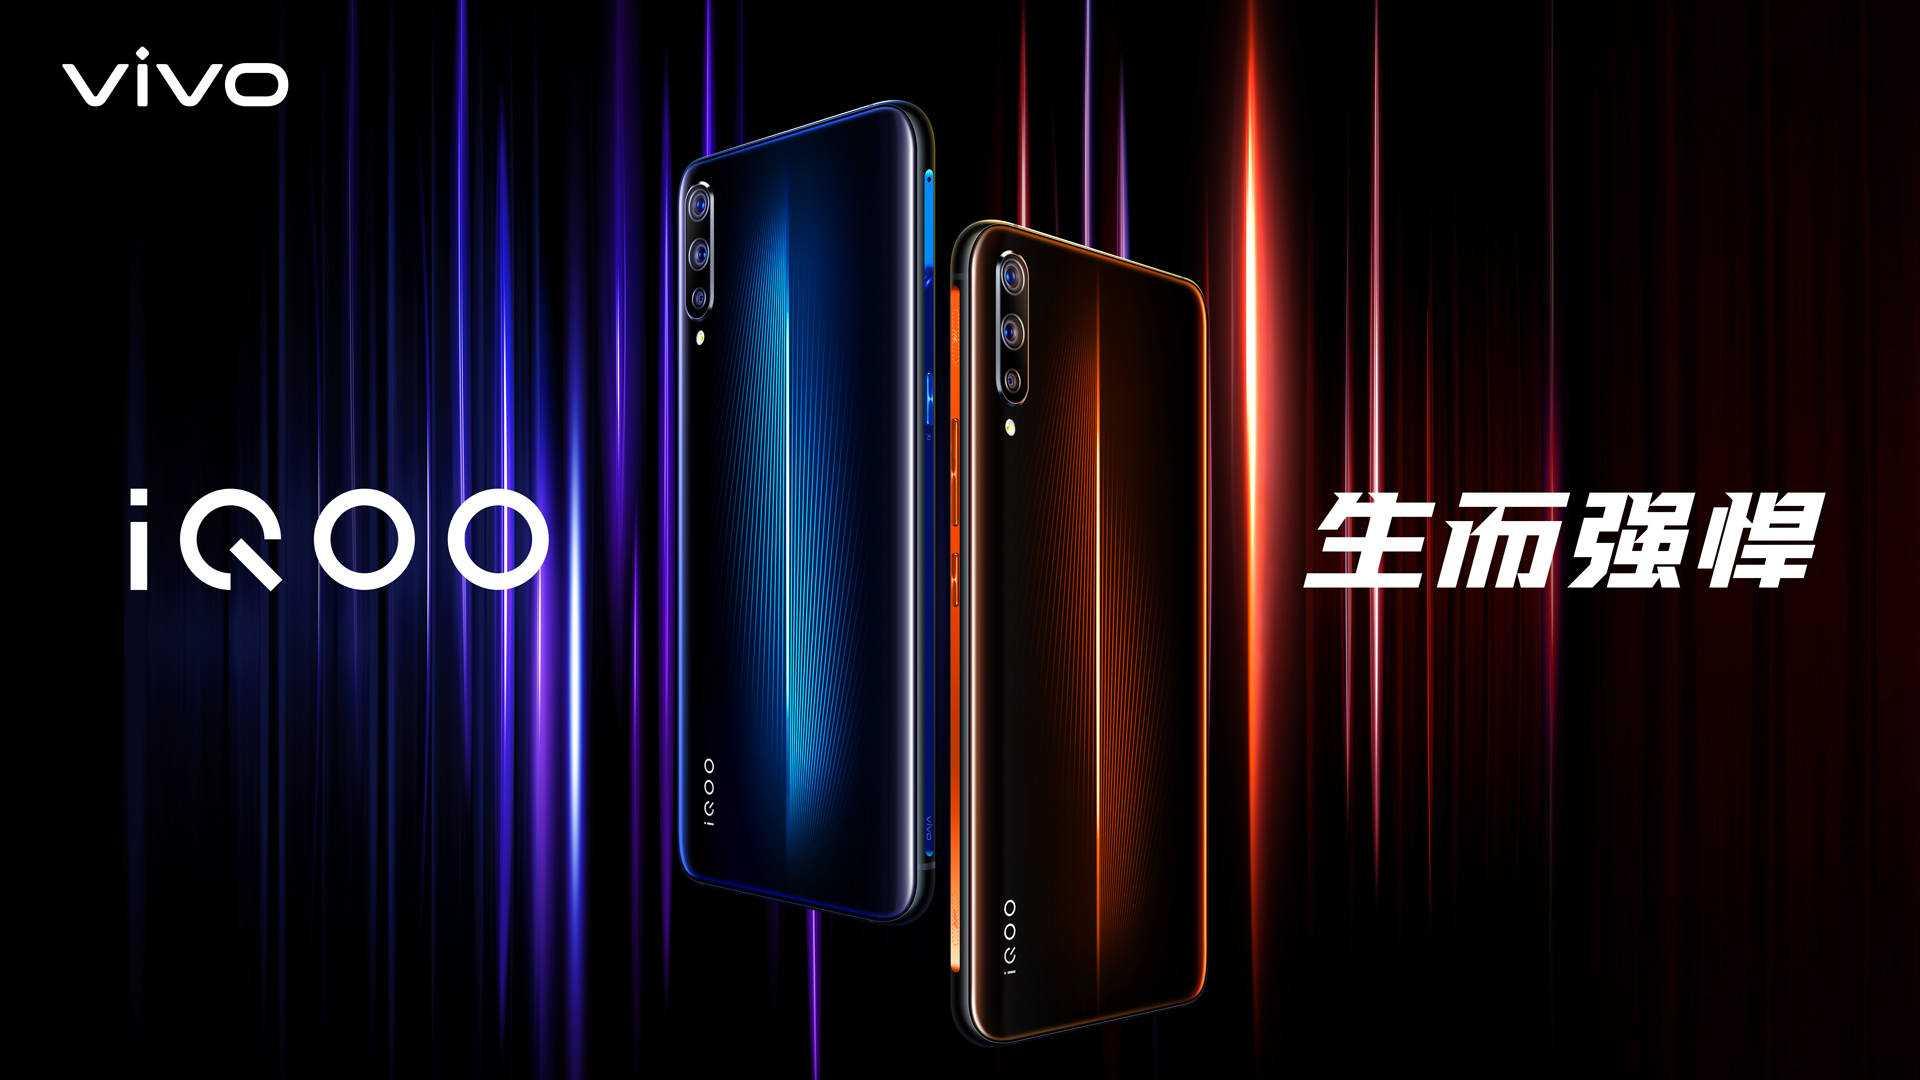 Vivo iQOO Launched